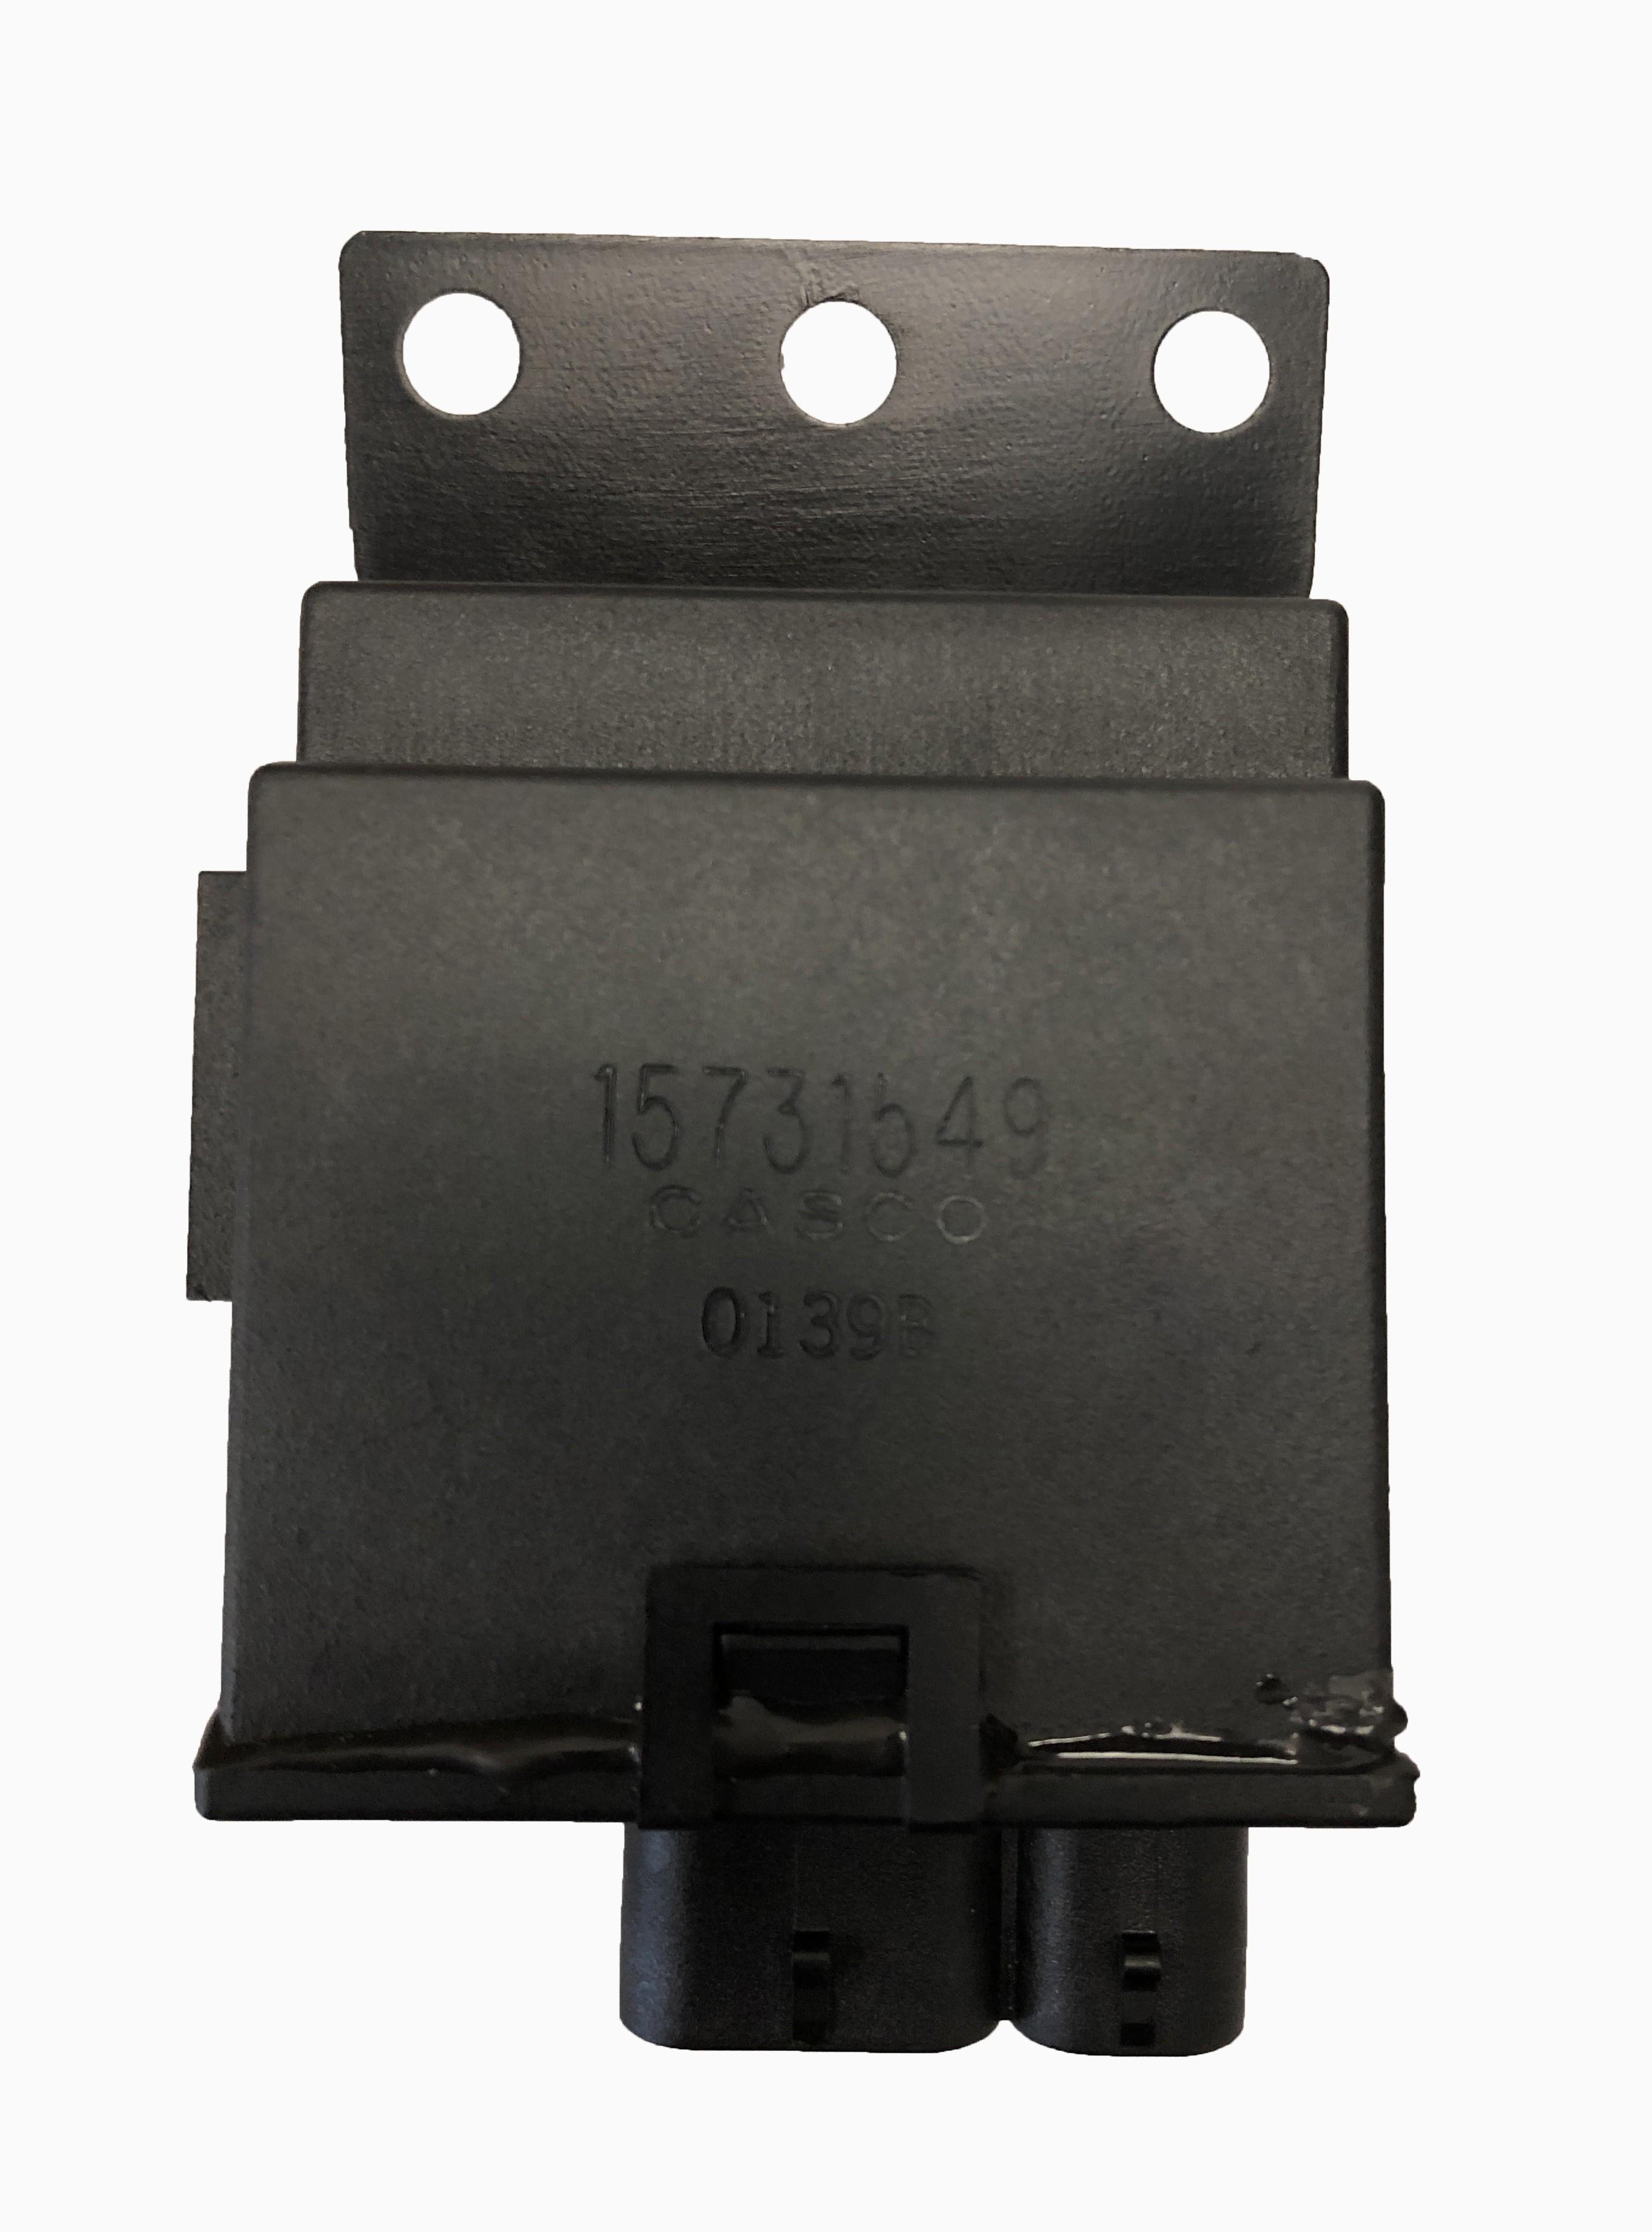 New OEM 15061010 Balance Fuel Pump Control Module for GM Trucks 98-02 Dual  Tank